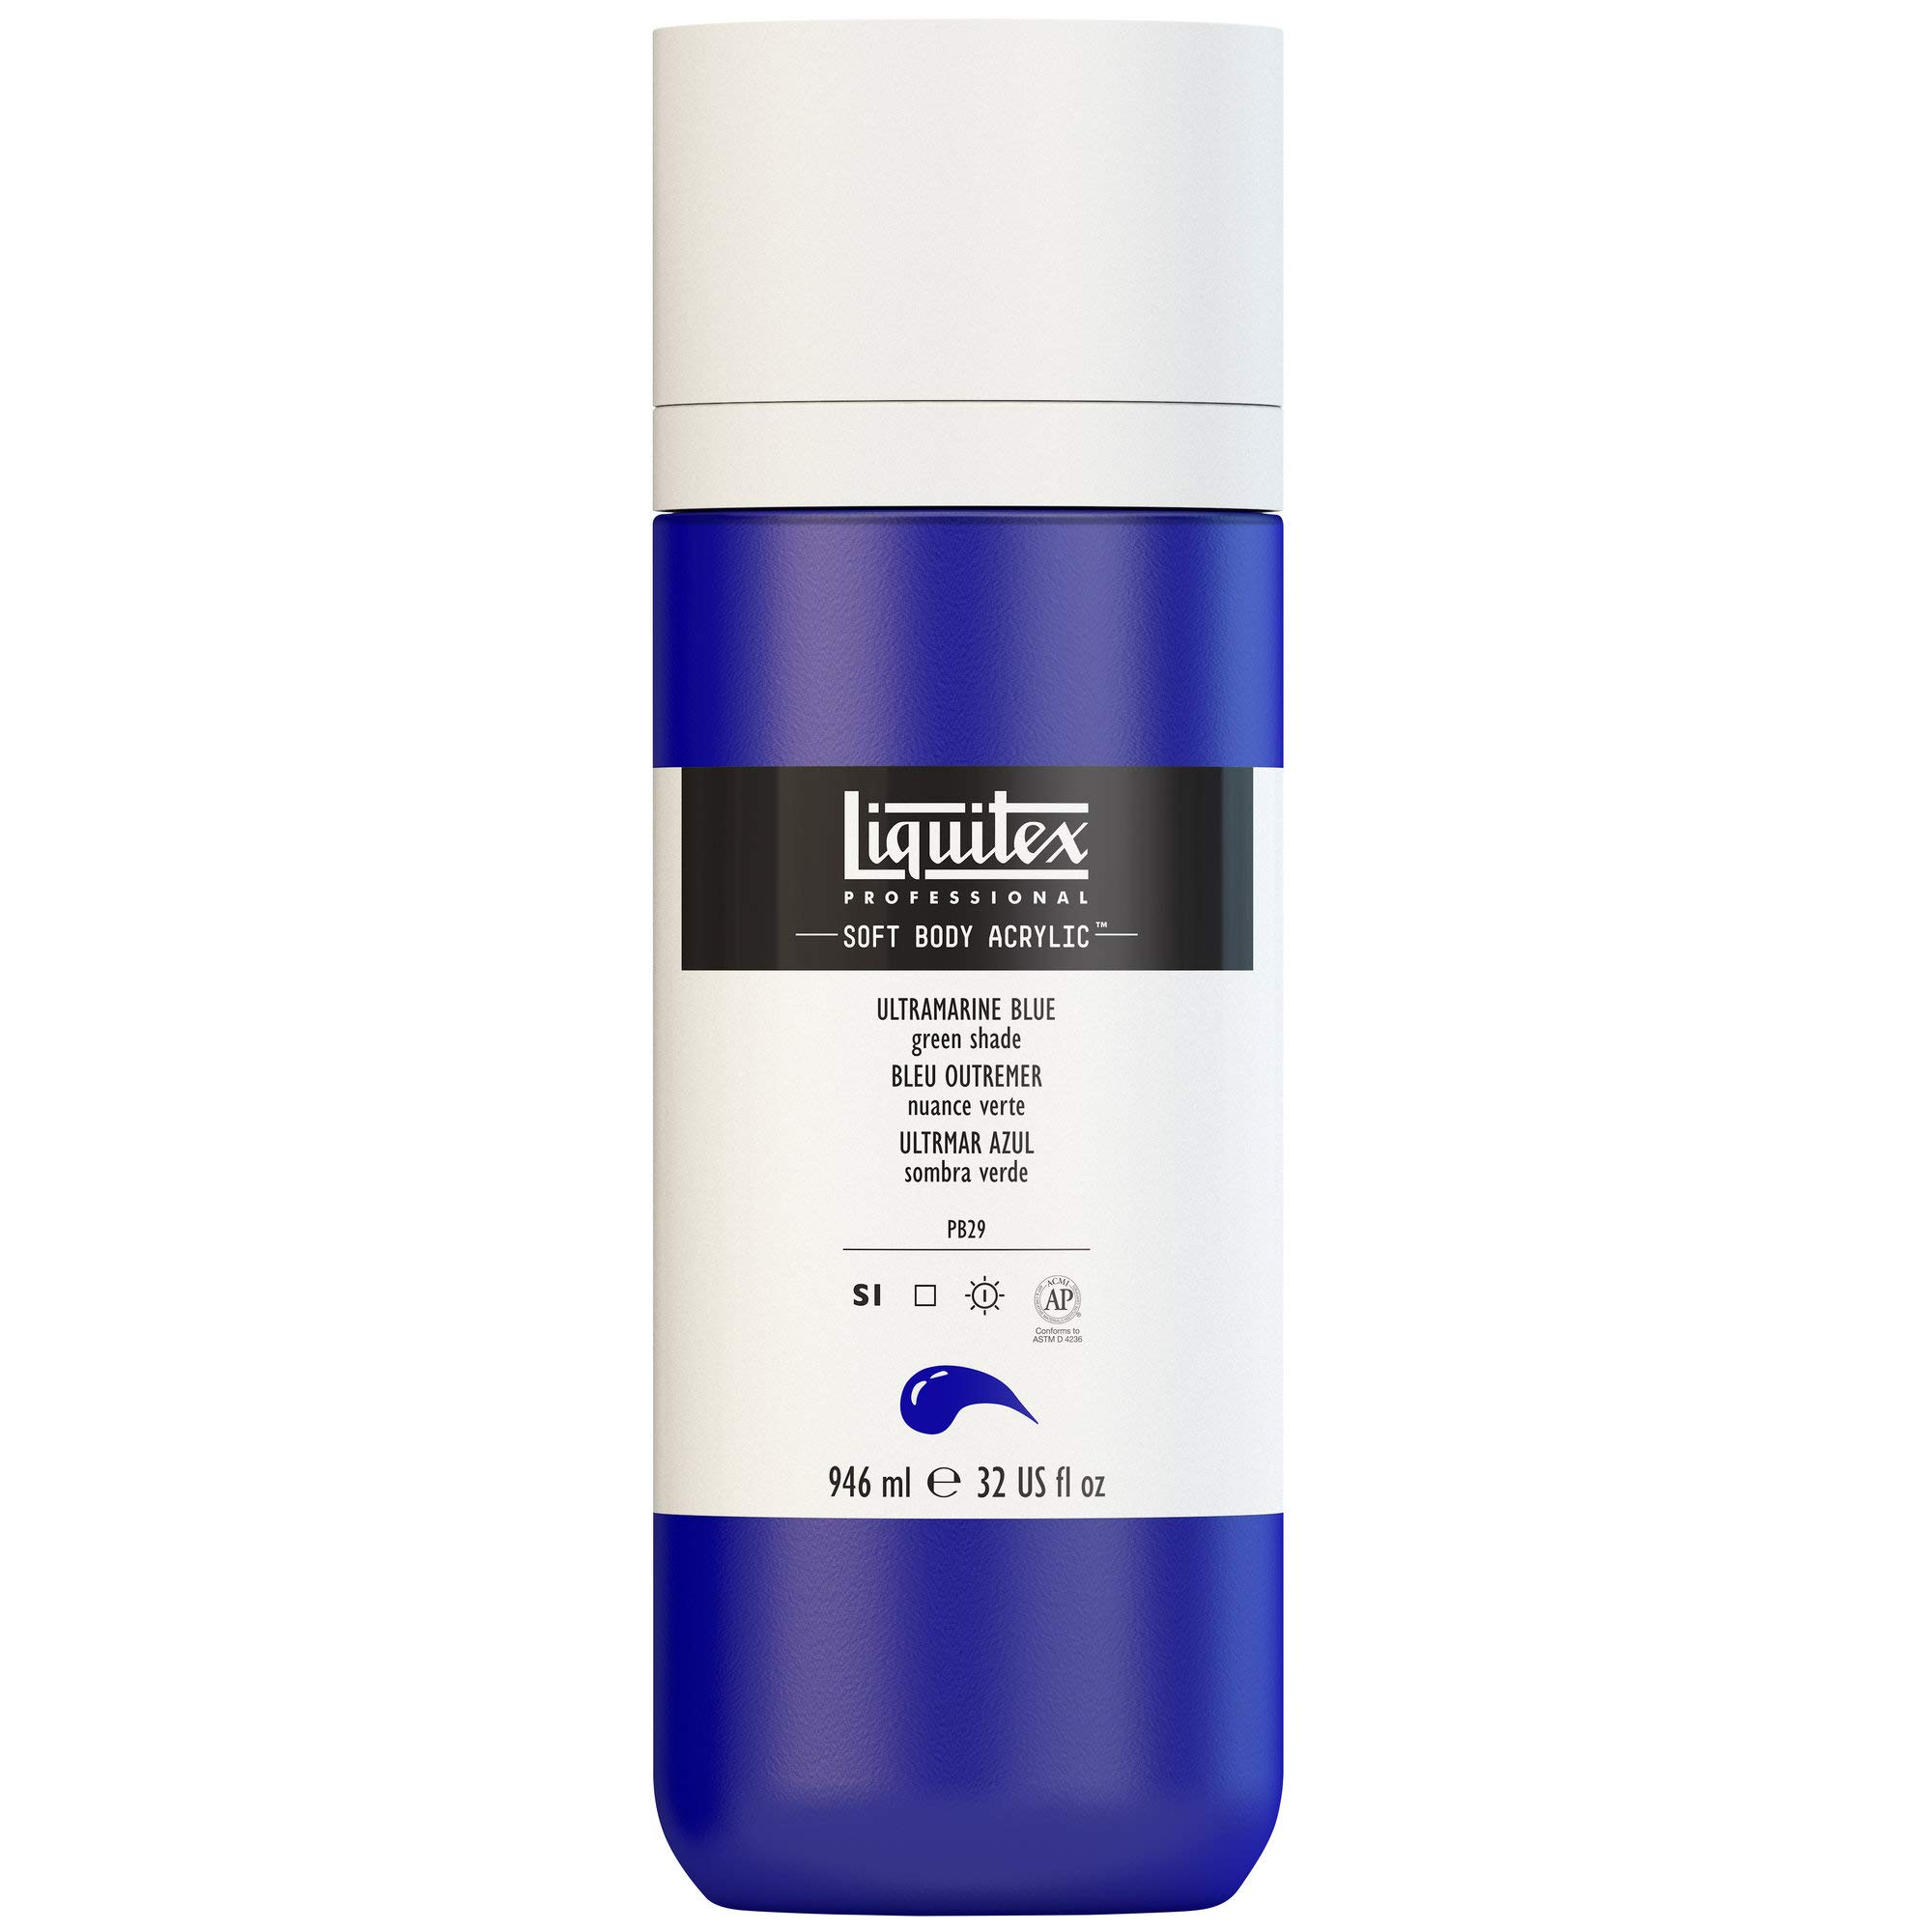 Liquitex Professional Soft Body Acrylic Paint 32-oz bottle, Ultramarine Blue (Green Shade)